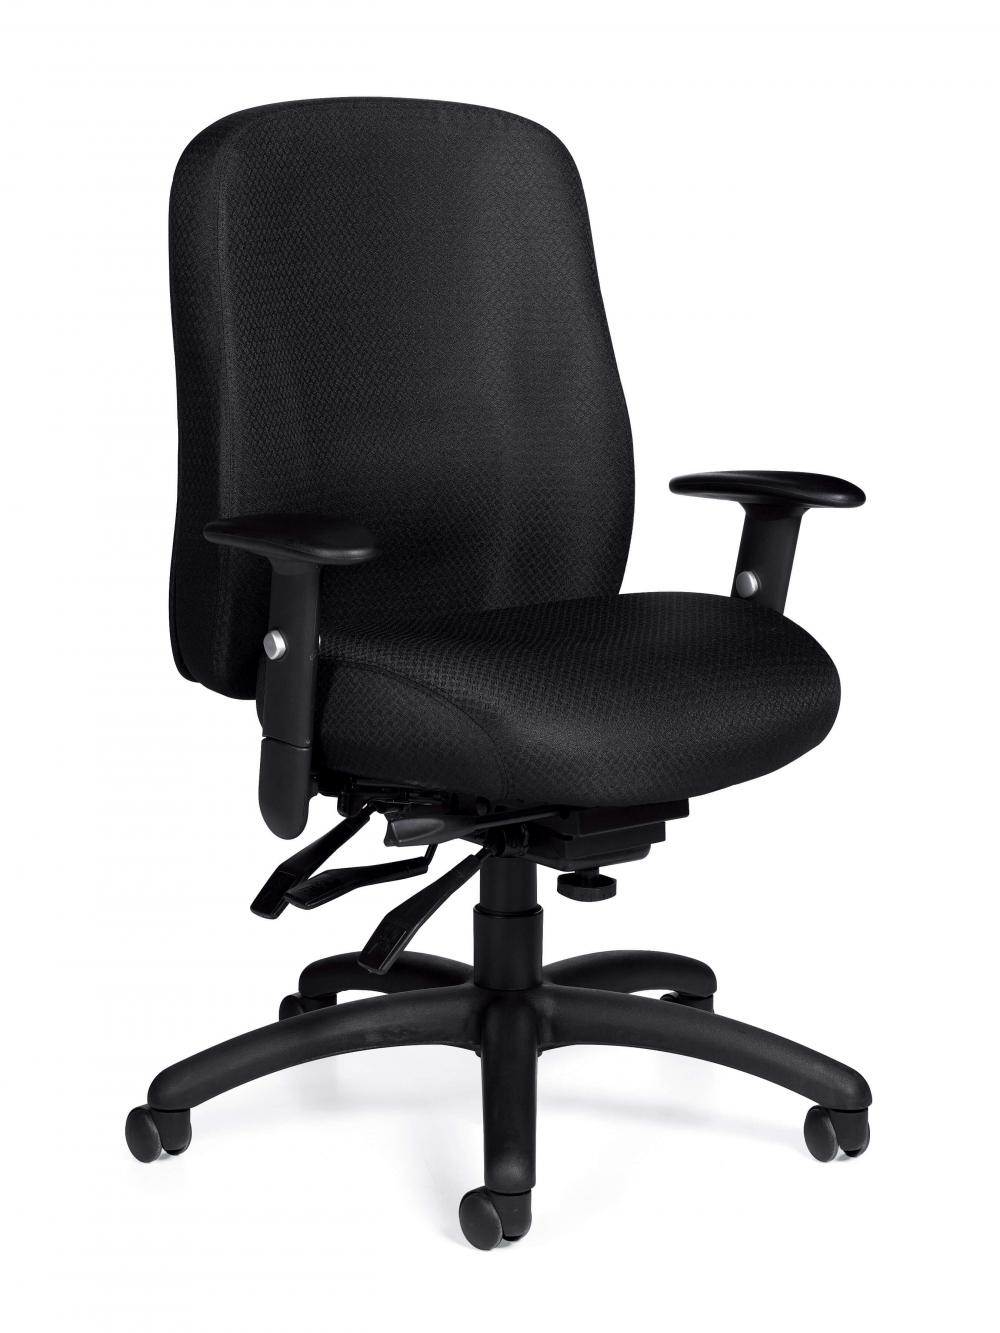 ergonomic chair back angle herman miller aeron office danni upholstered desk chairs